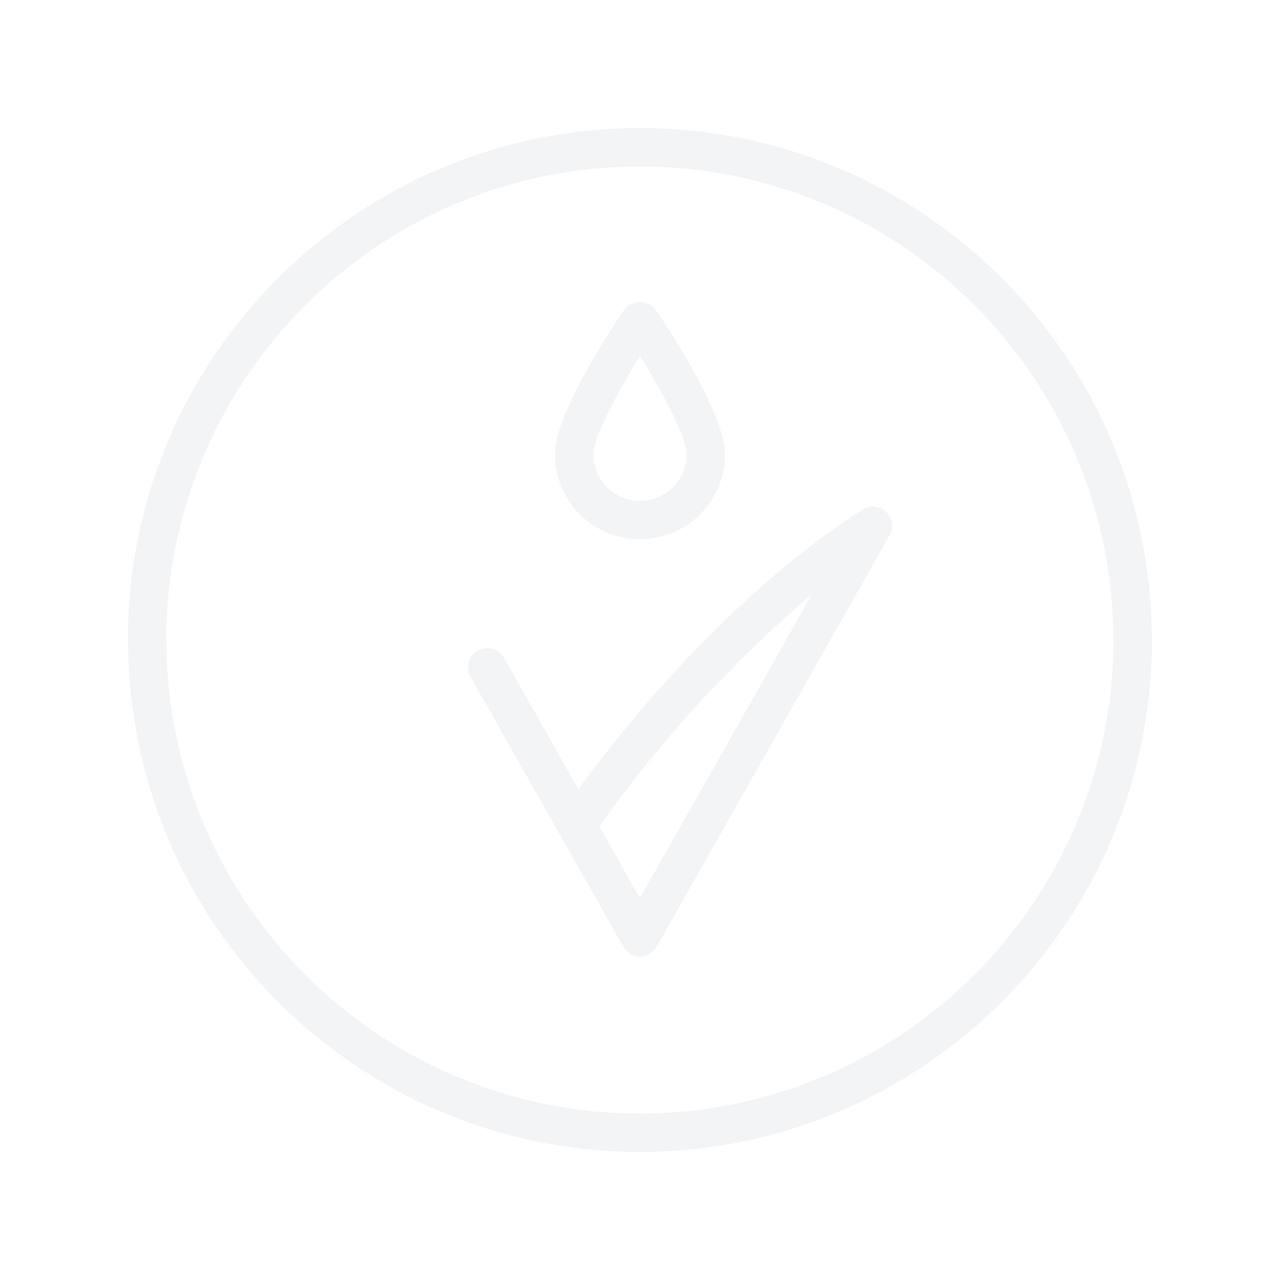 MIZON Joyful Time Essence Snail Mask 23g тканевая маска для лица